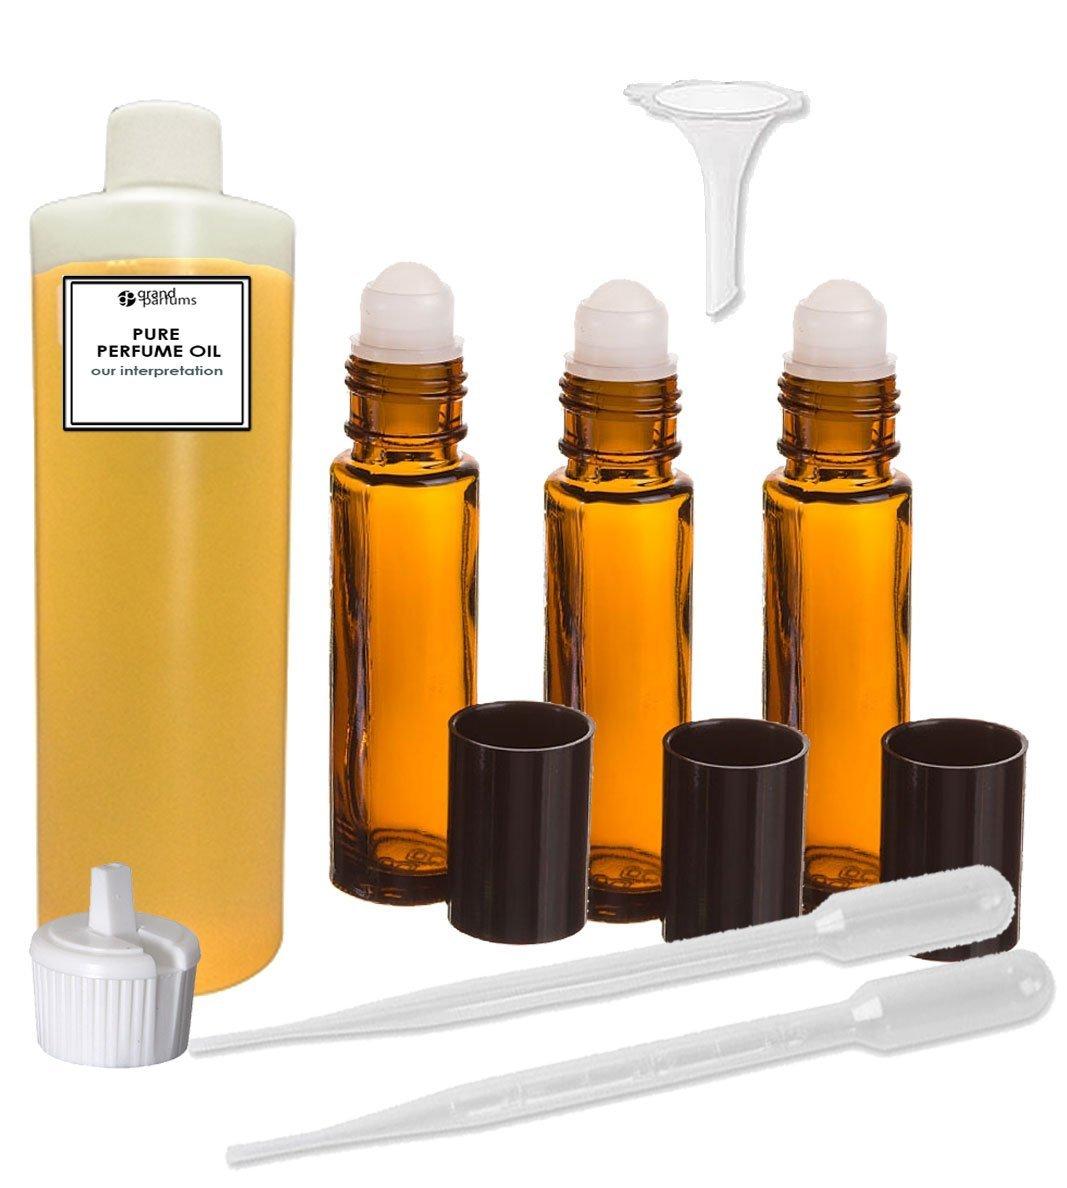 Grand Parfums Perfume Oil Set - True Religion Body Oil For Women Scented Fragrance Oil (8 oz)